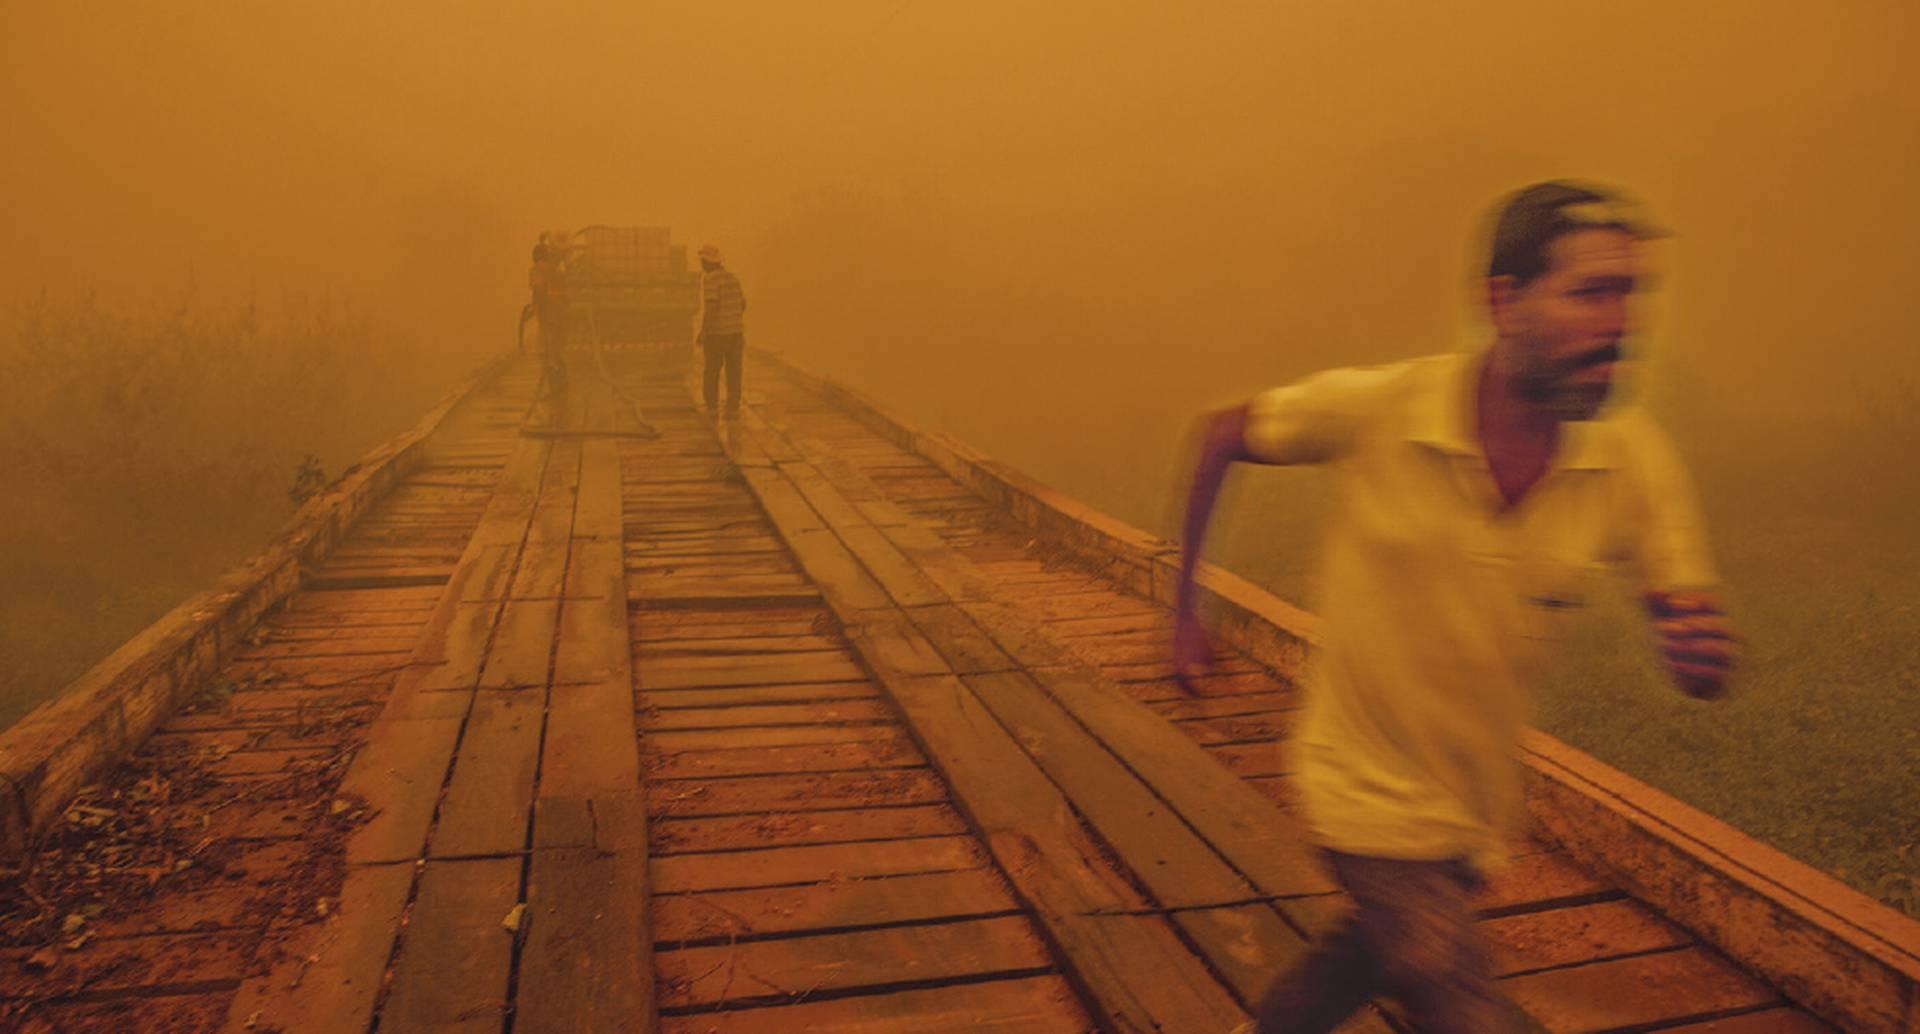 En Pantanal, Brasil, un hombre corre a sofocar los incendios.